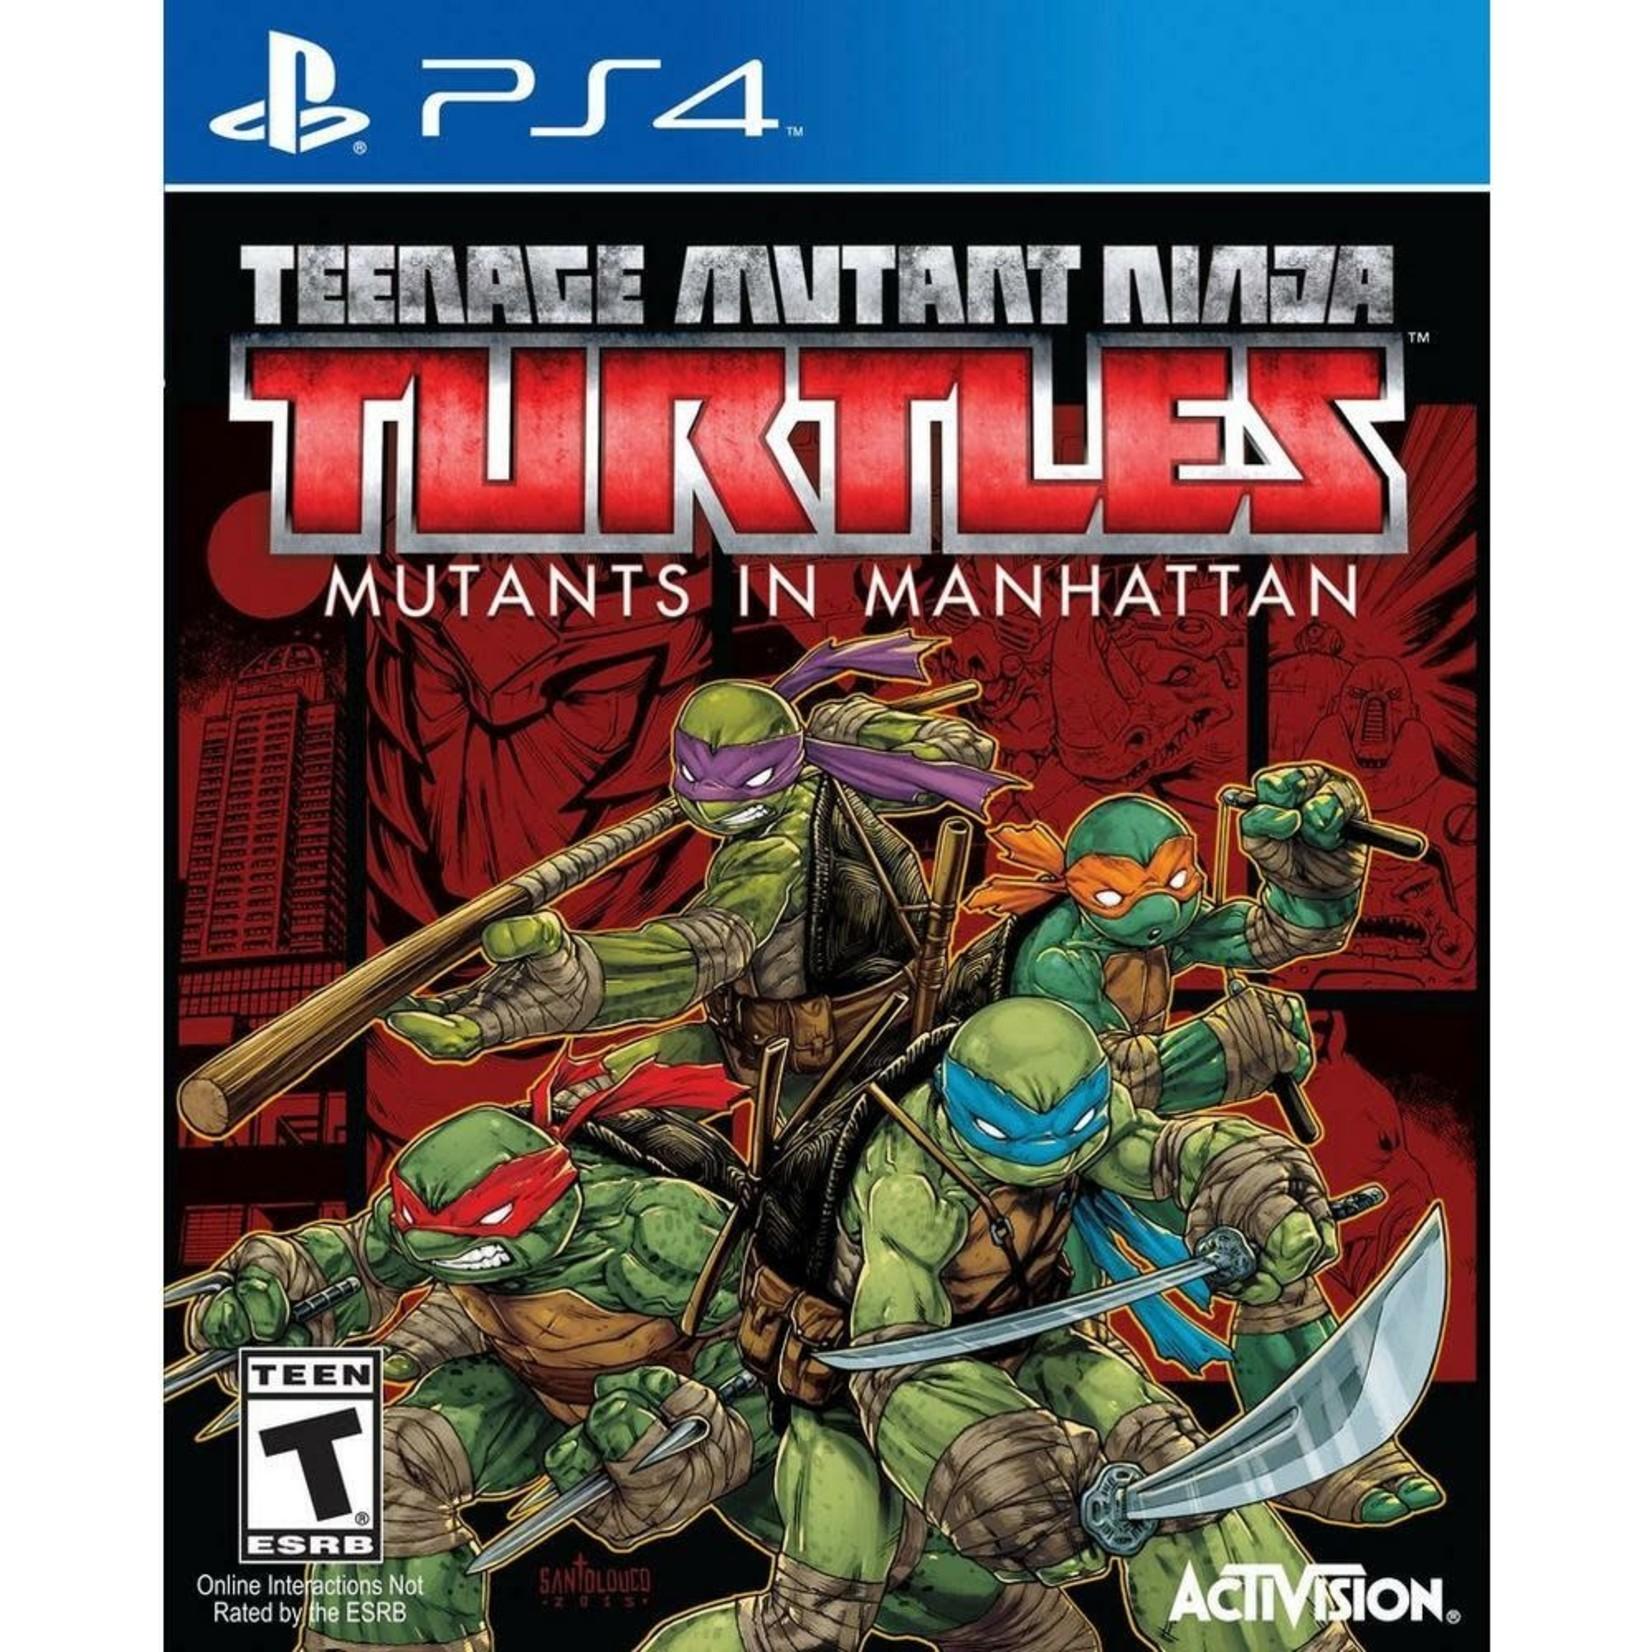 PS4U-TEENAGE MUTANT NINJA TURTLES: MUTANTS IN MANHATTAN